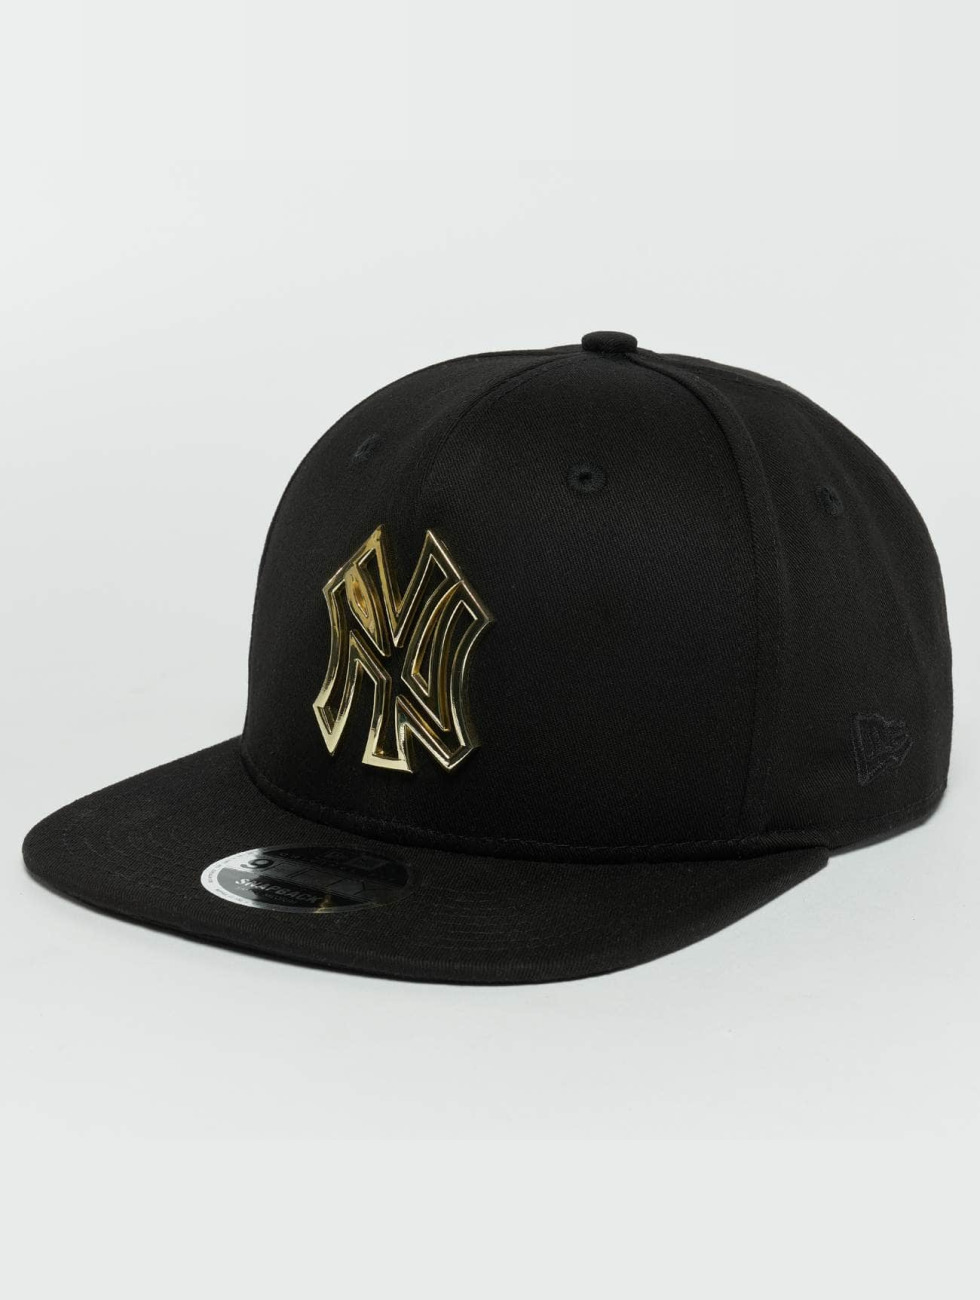 New Era Casquette Snapback & Strapback Metal Badge NY Yankees noir